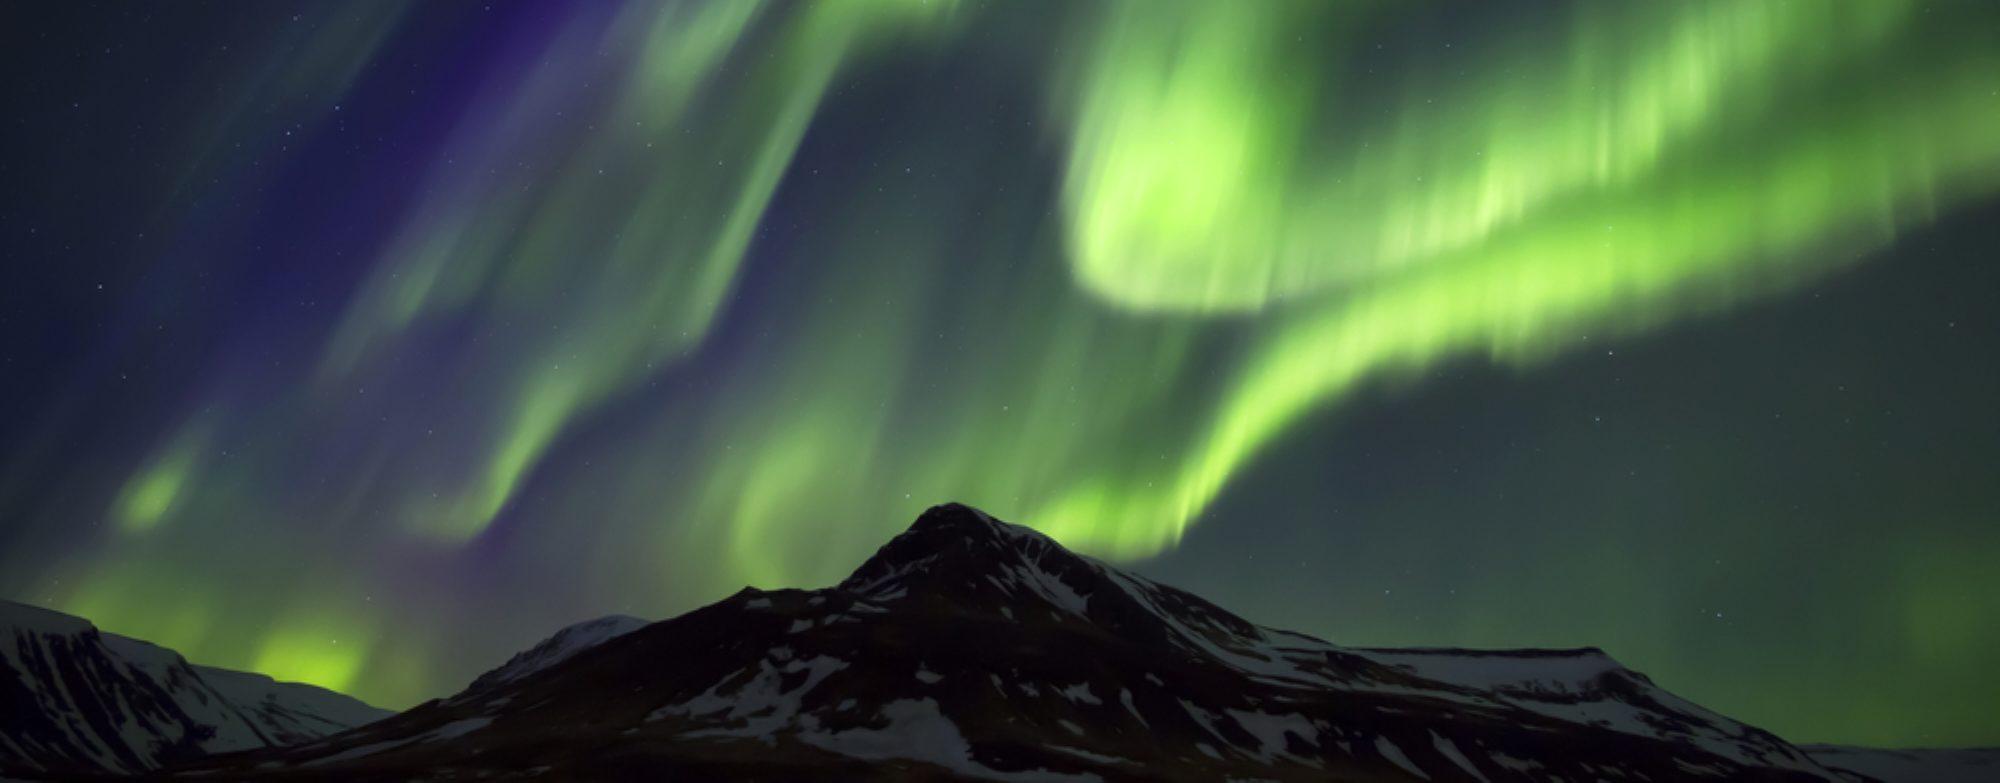 Private Wilderness Cabin Northern Lights Breaks